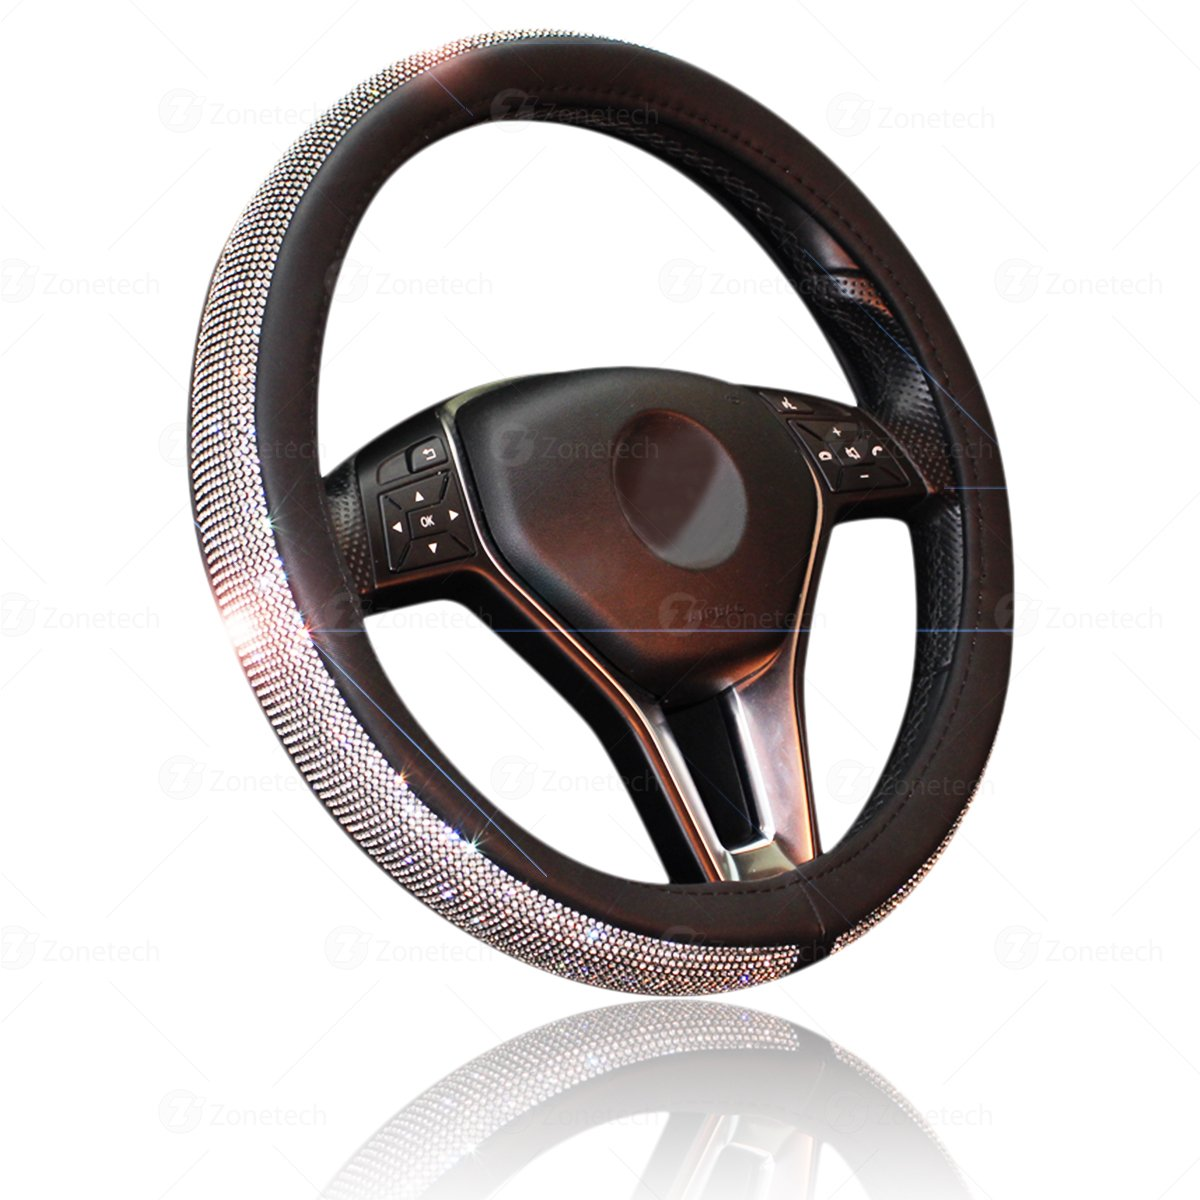 Zone Tech Shiny Steering Wheels Bling Shiny Diamond Wheel Protector Comfort Wheels Car Crystal Bling Wheel Cover Anti-Slip Rhinestones PU Leather Backing